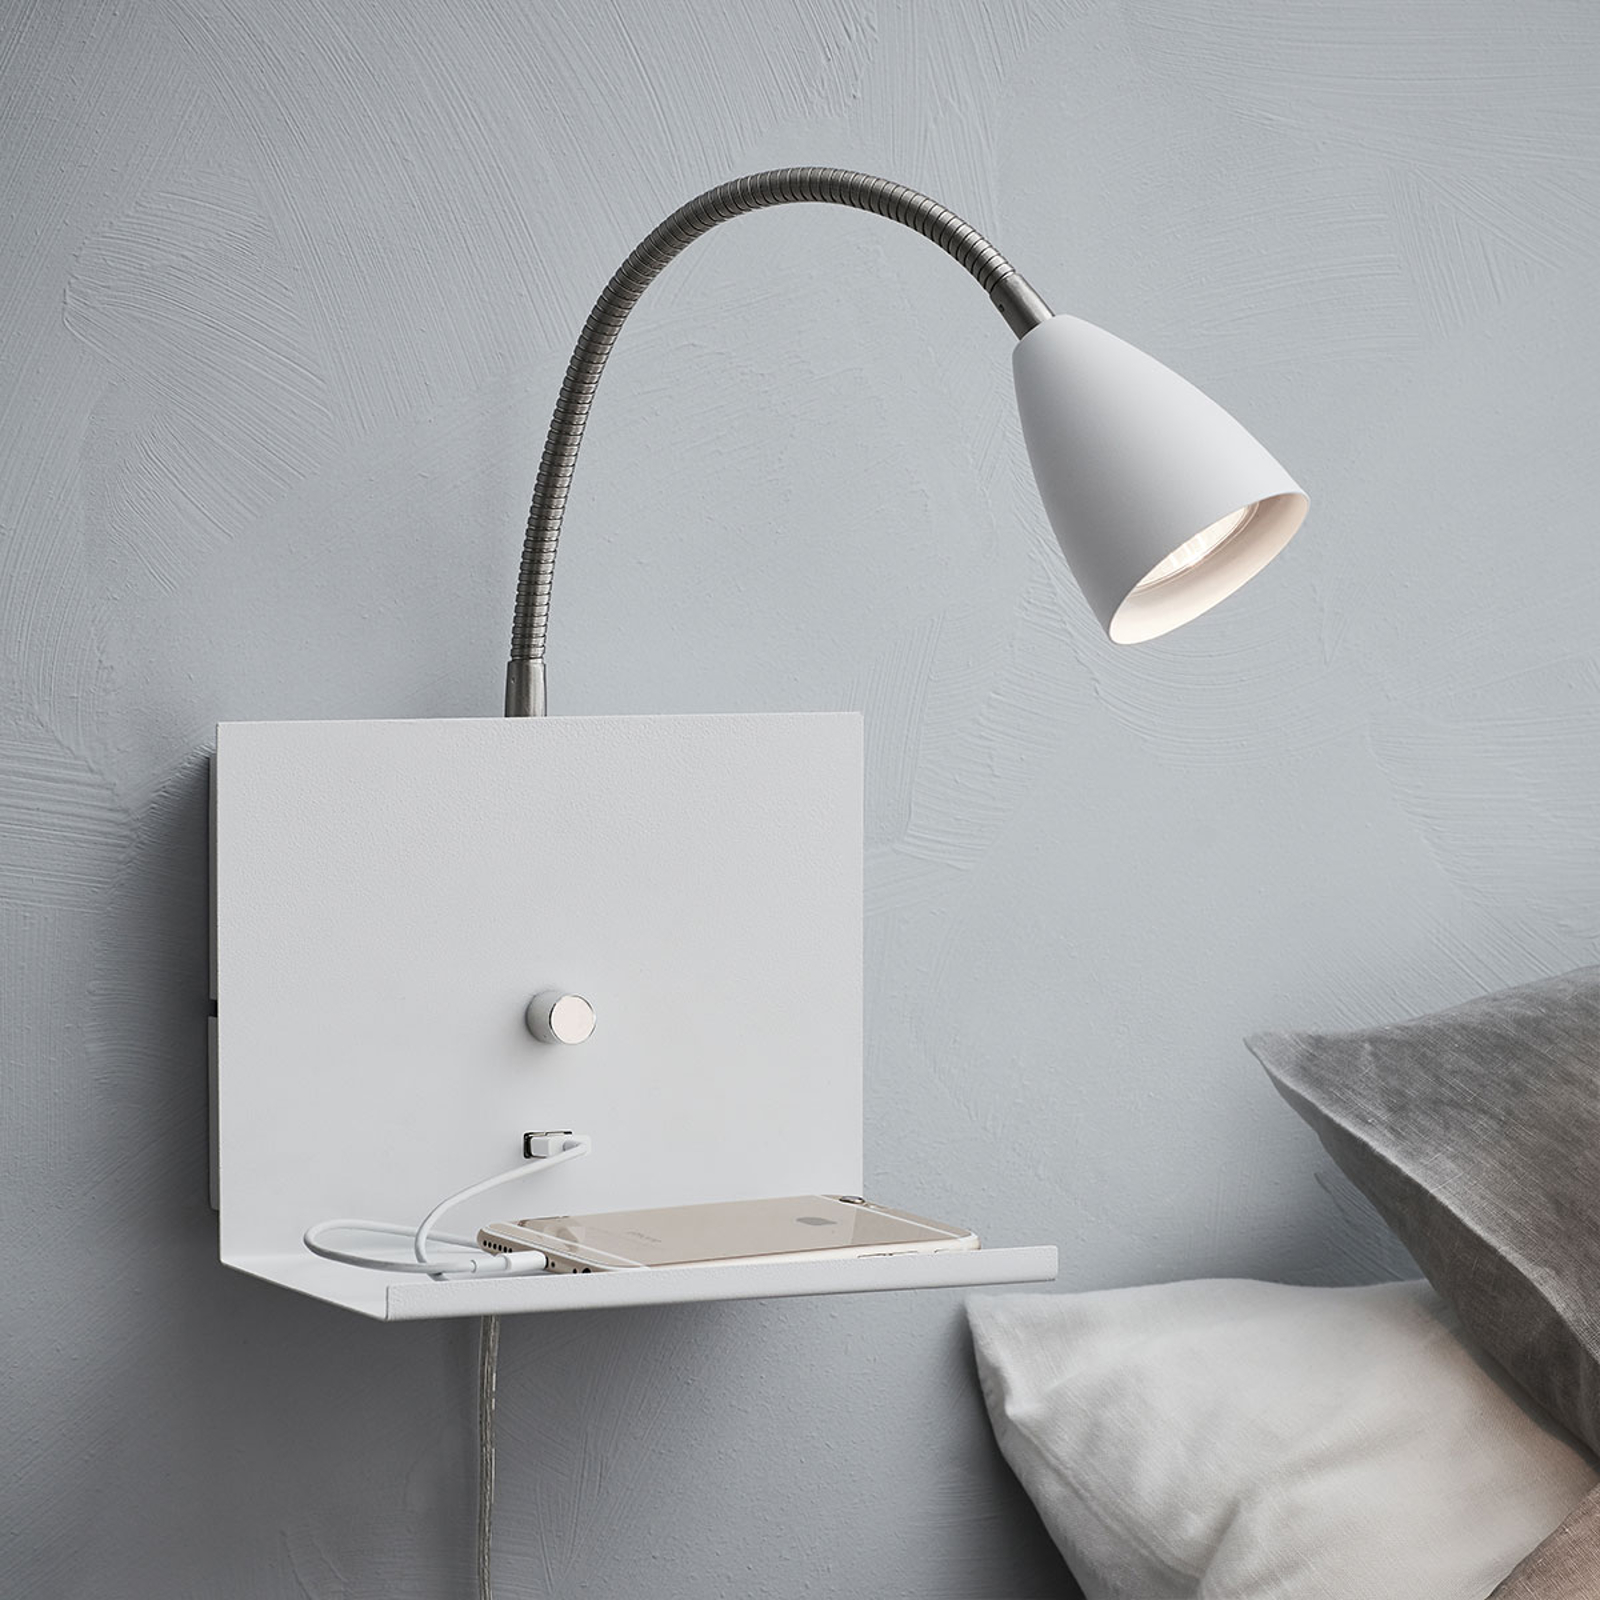 Wandlamp Logi met plank, wit